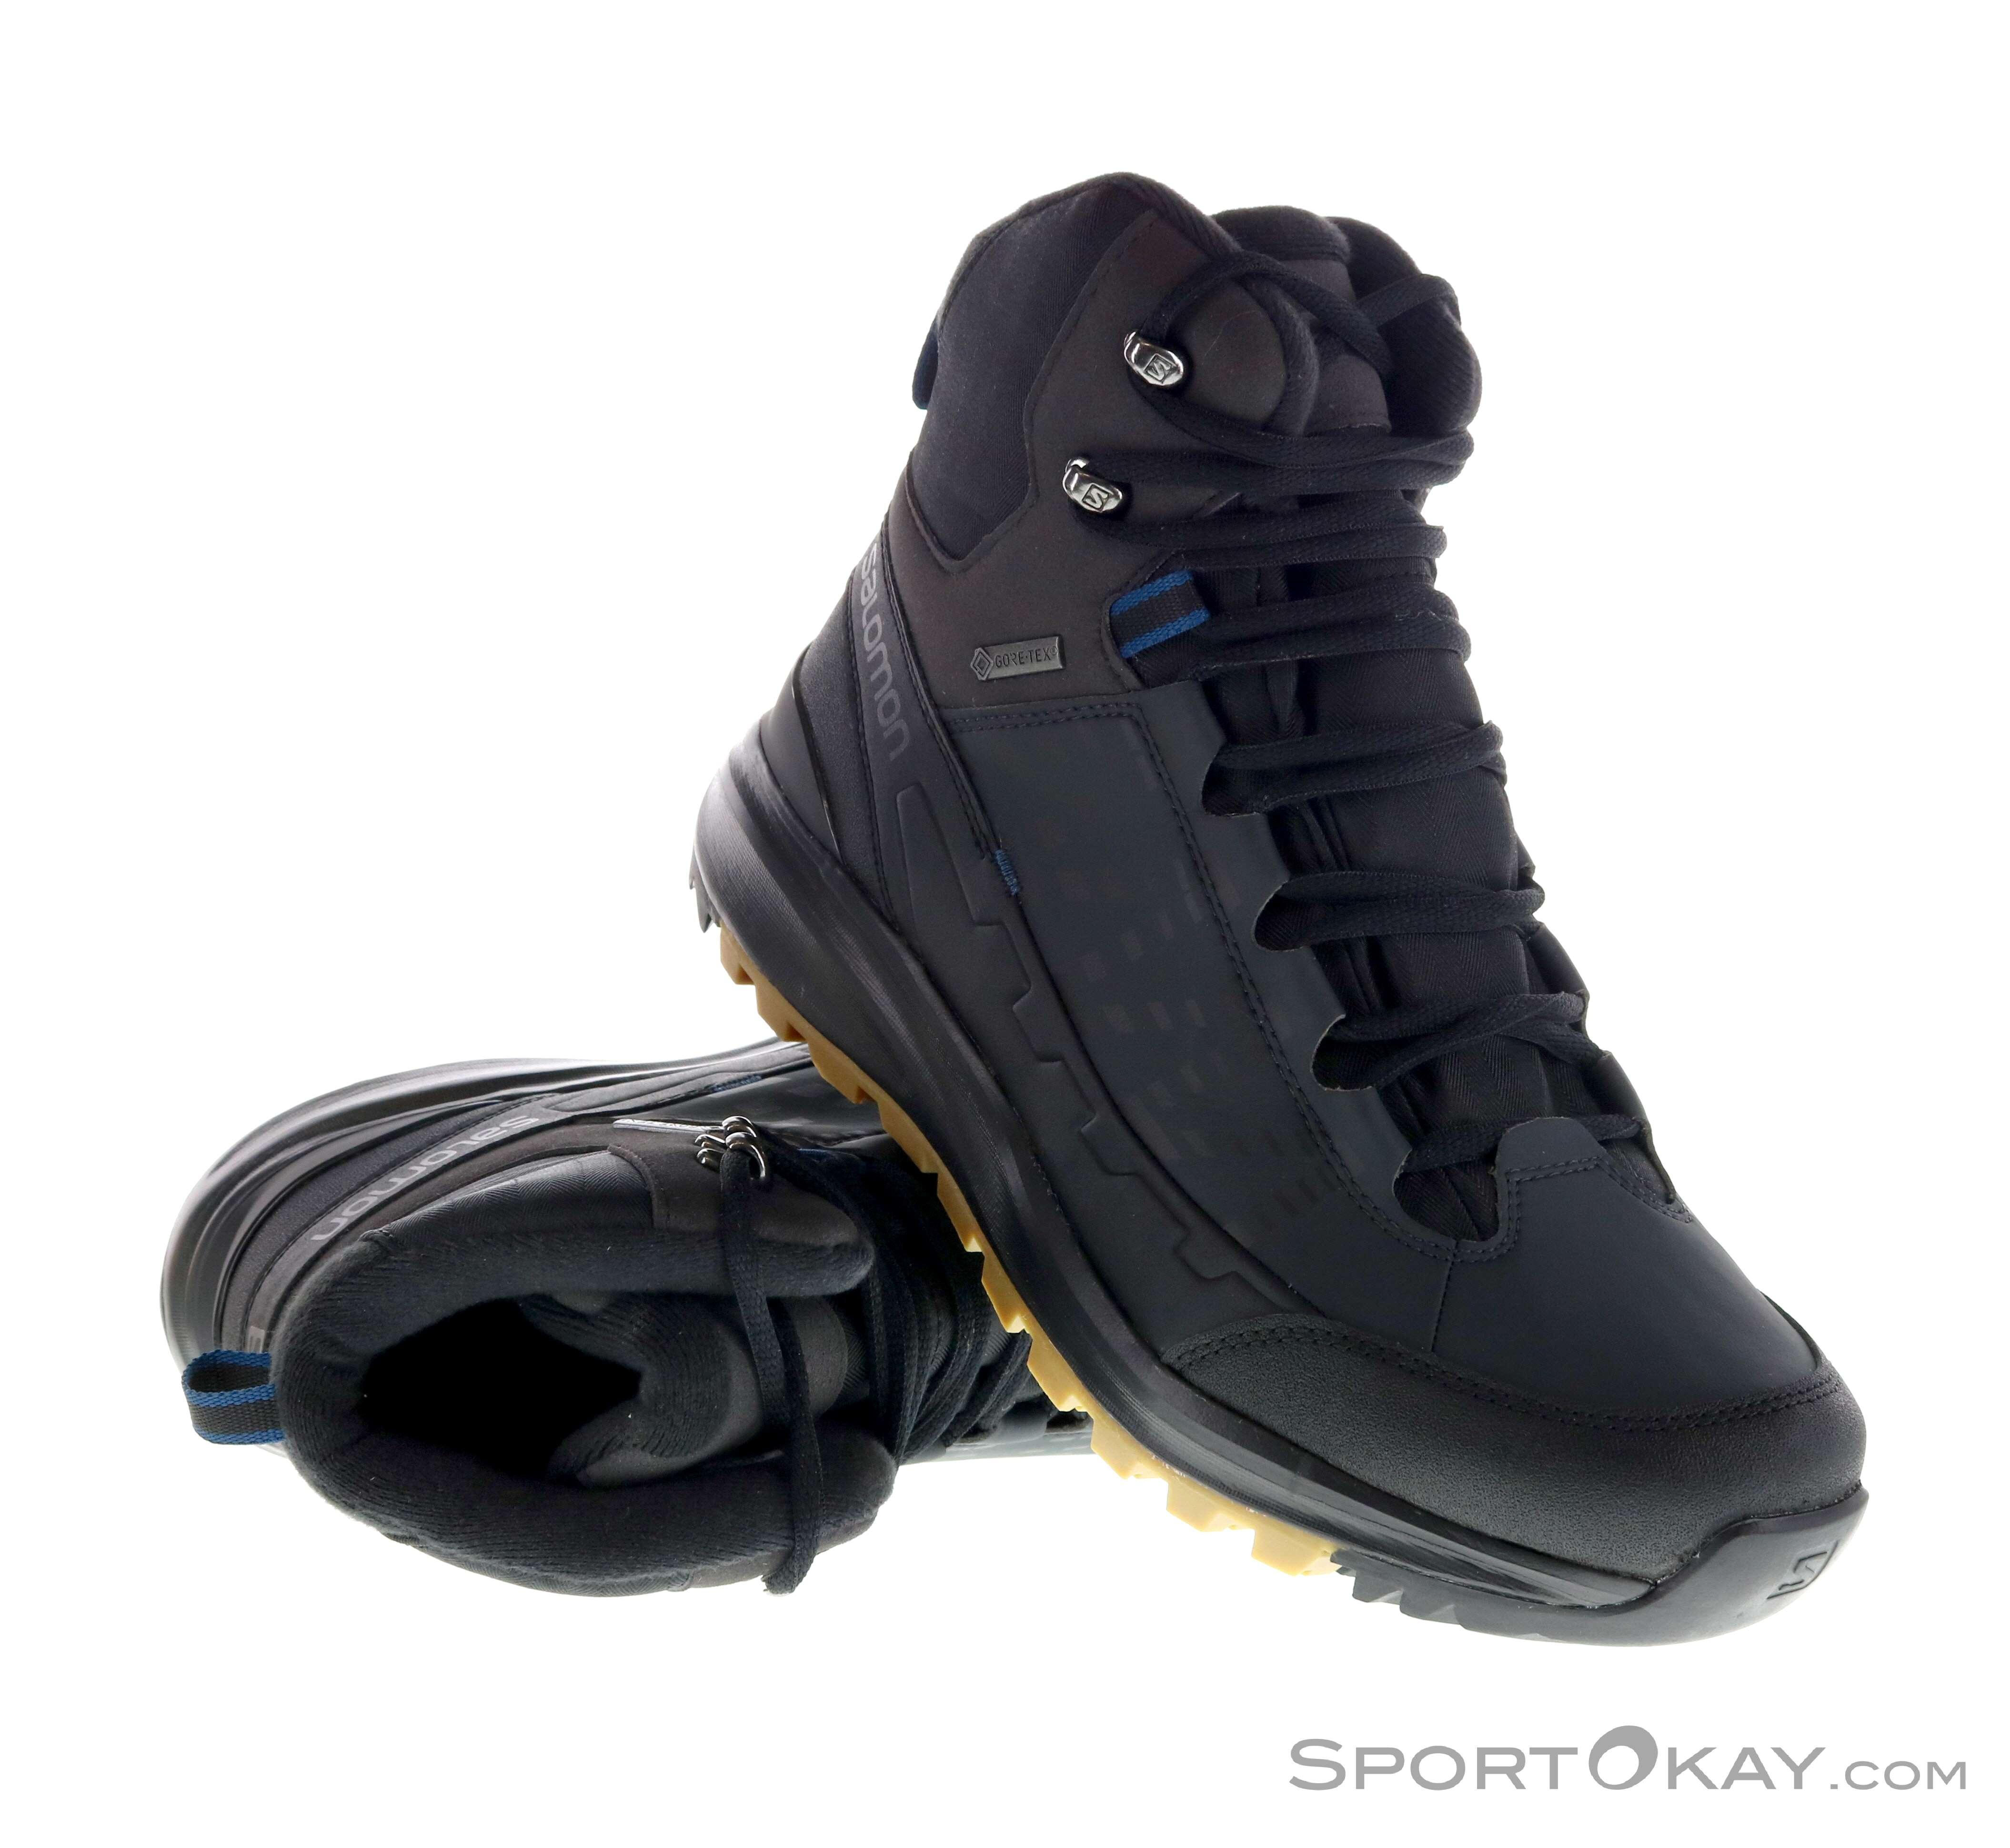 new products 5f33b ac4f8 Salomon Salomon Kaipo Mid GTX Mens Winter Shoes Gore-Tex